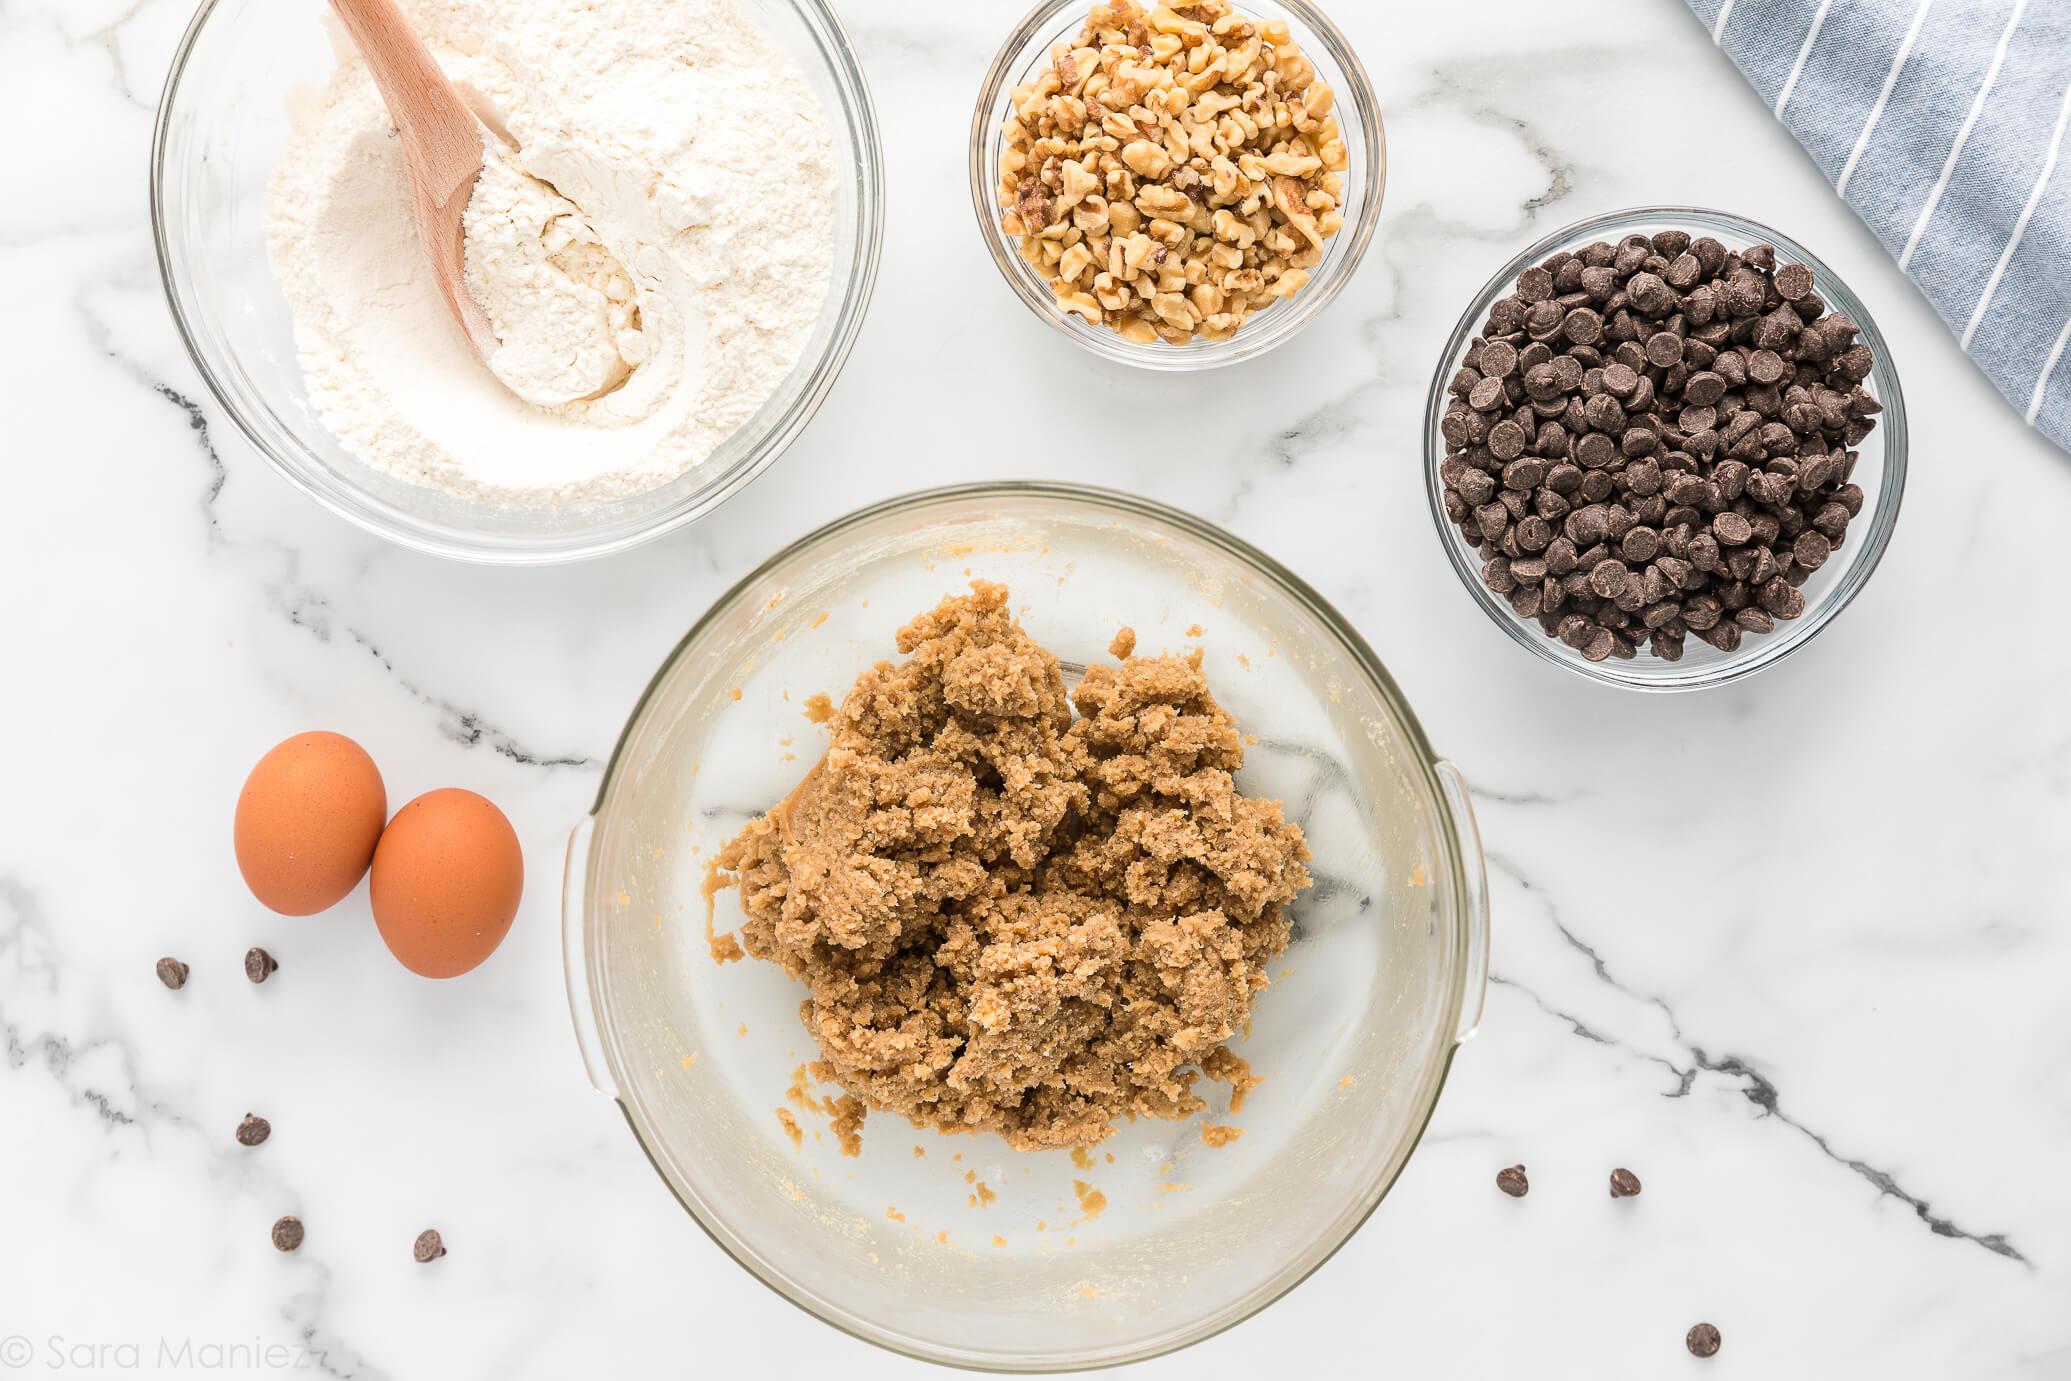 Chocolate Chip Cookies recipe process photos